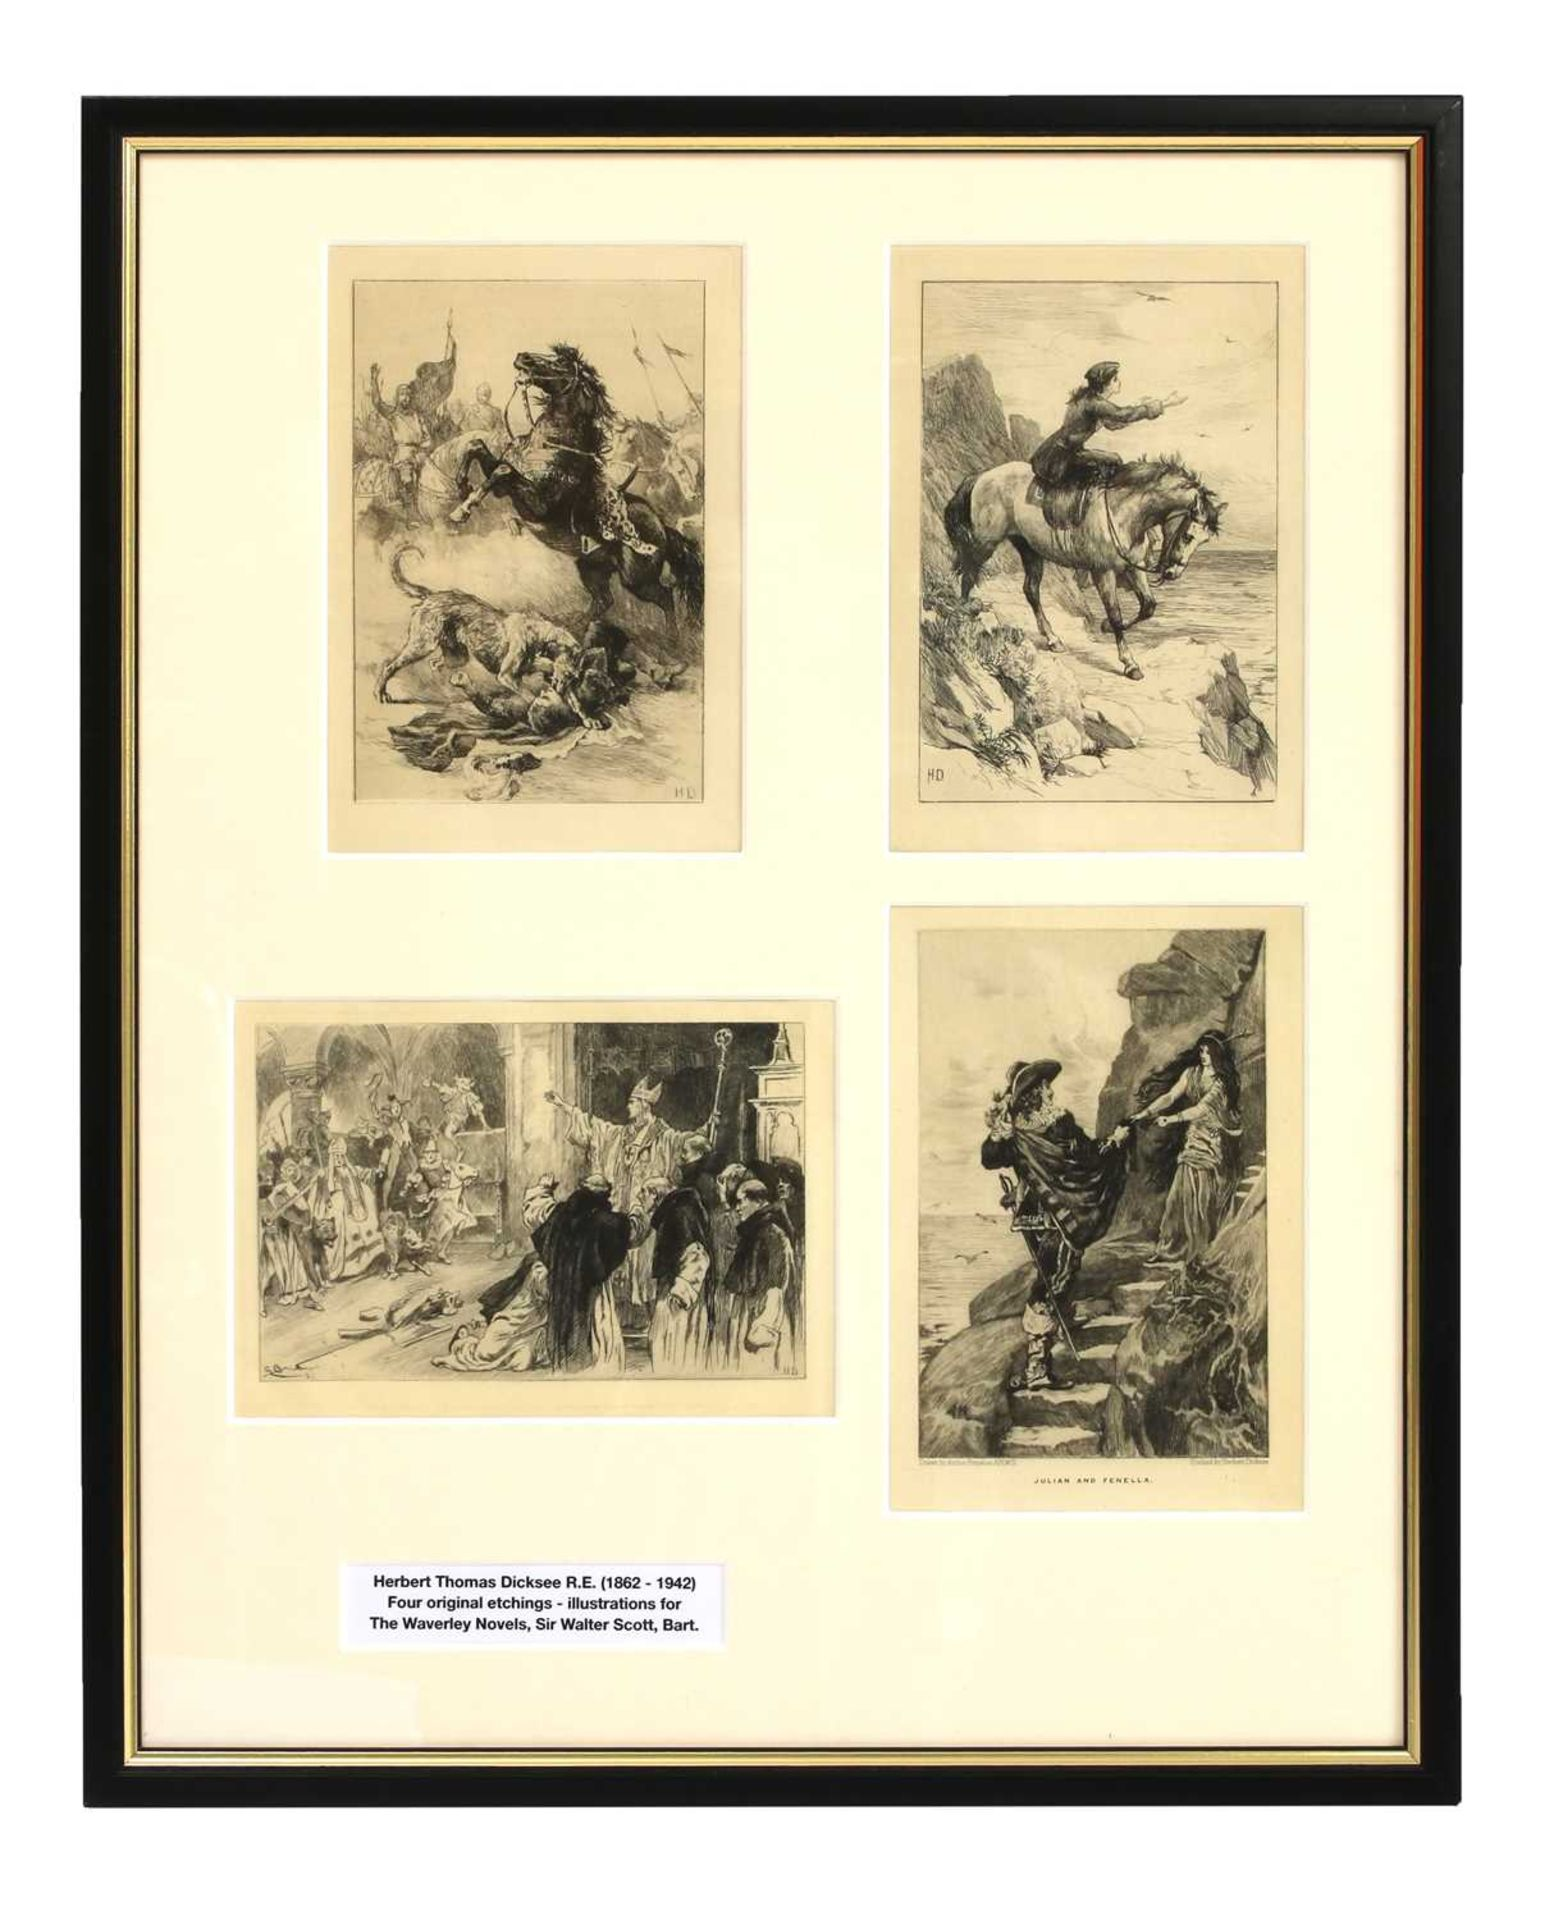 Herbert Thomas Dicksee RE (1862-1942) - Image 2 of 9